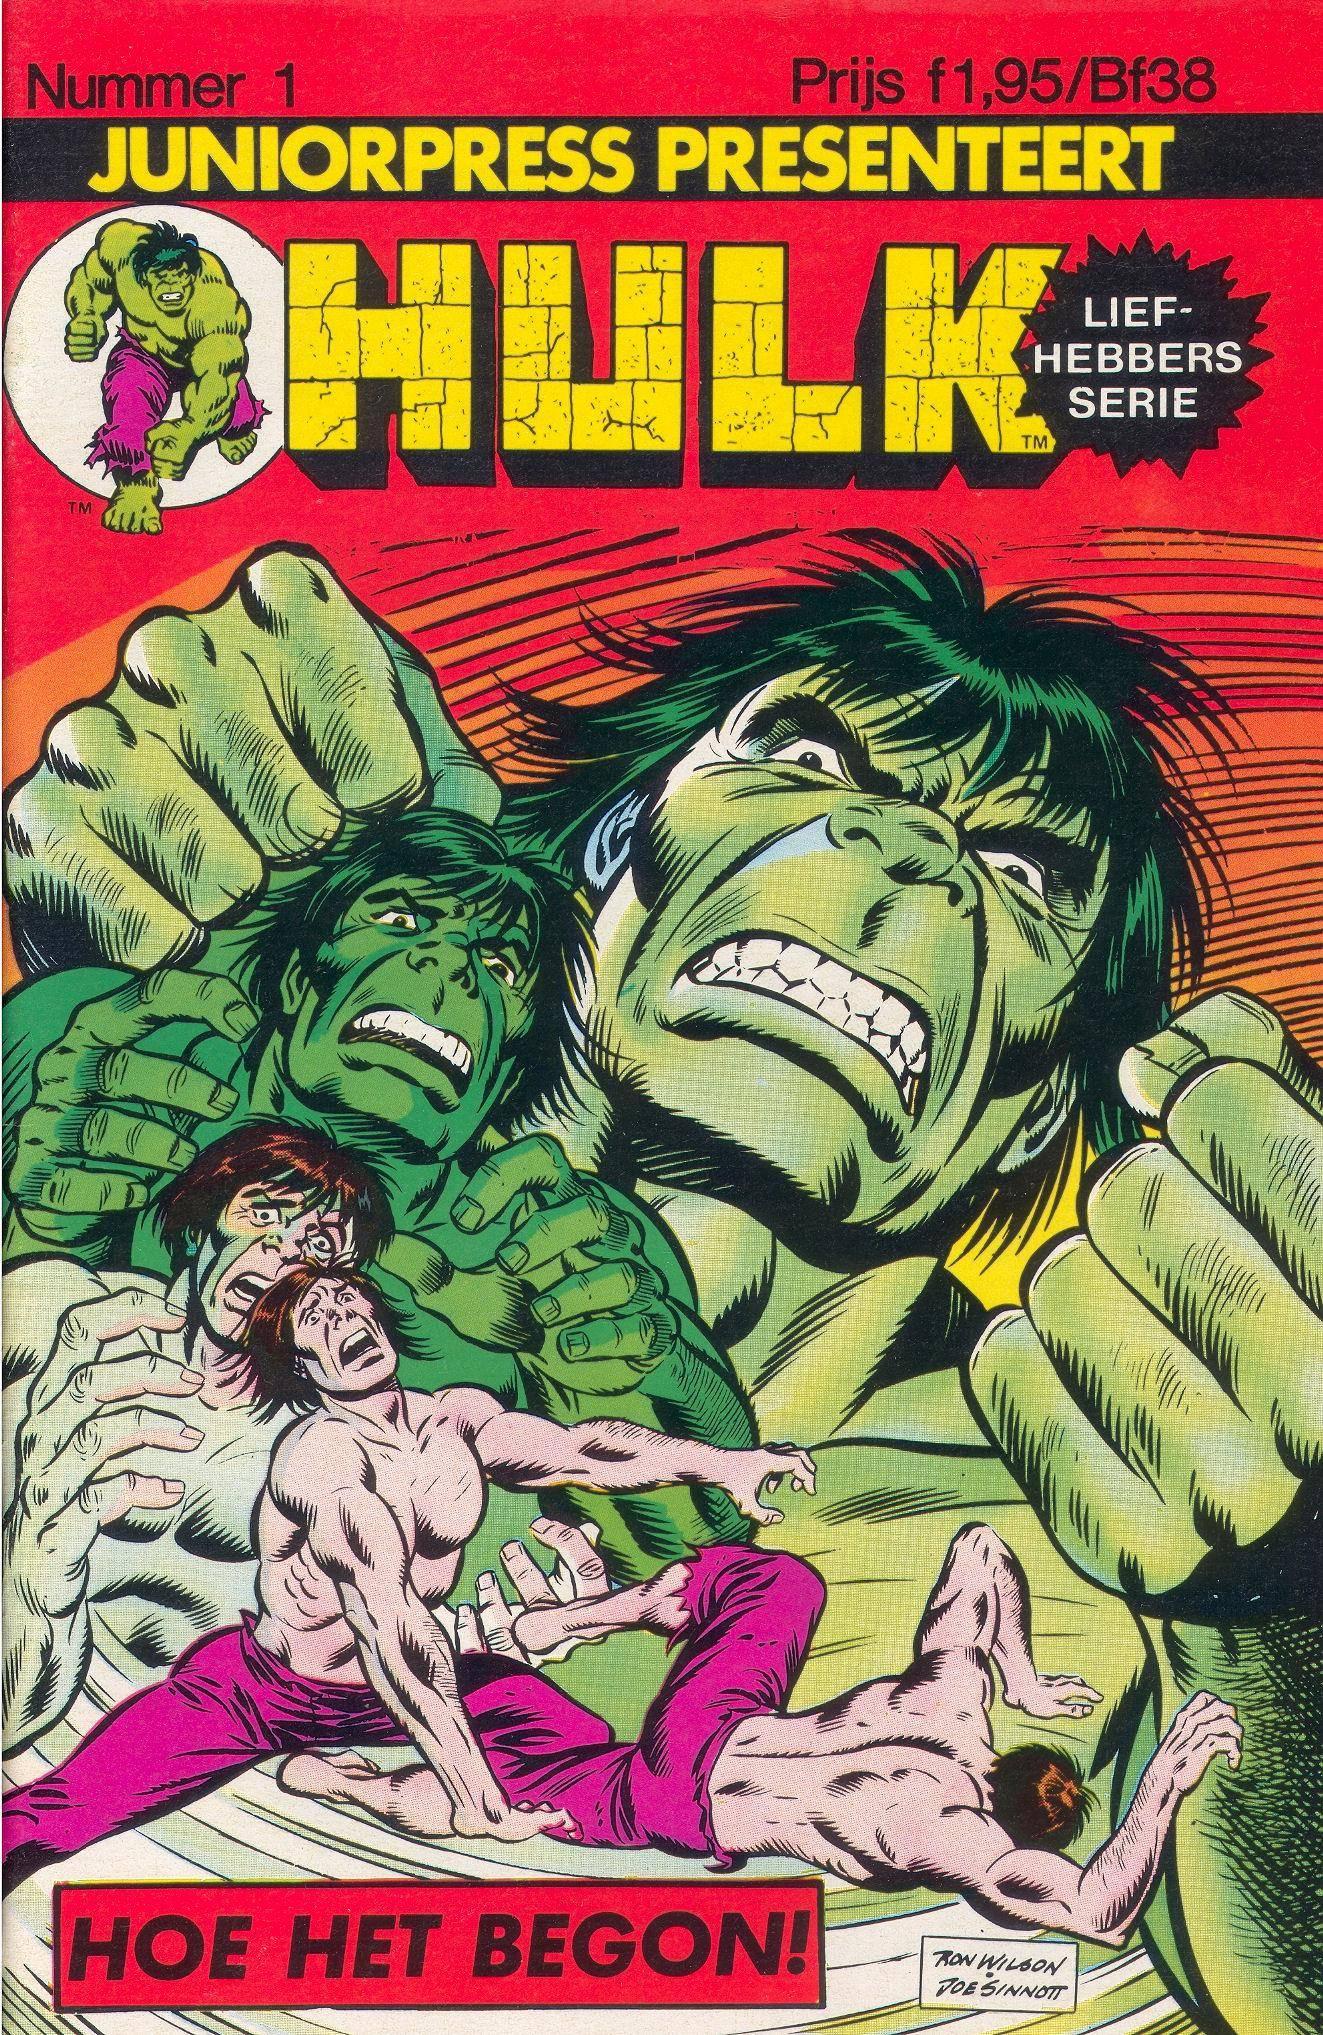 Hulk Liefhebbers Serie 01-11 (c)